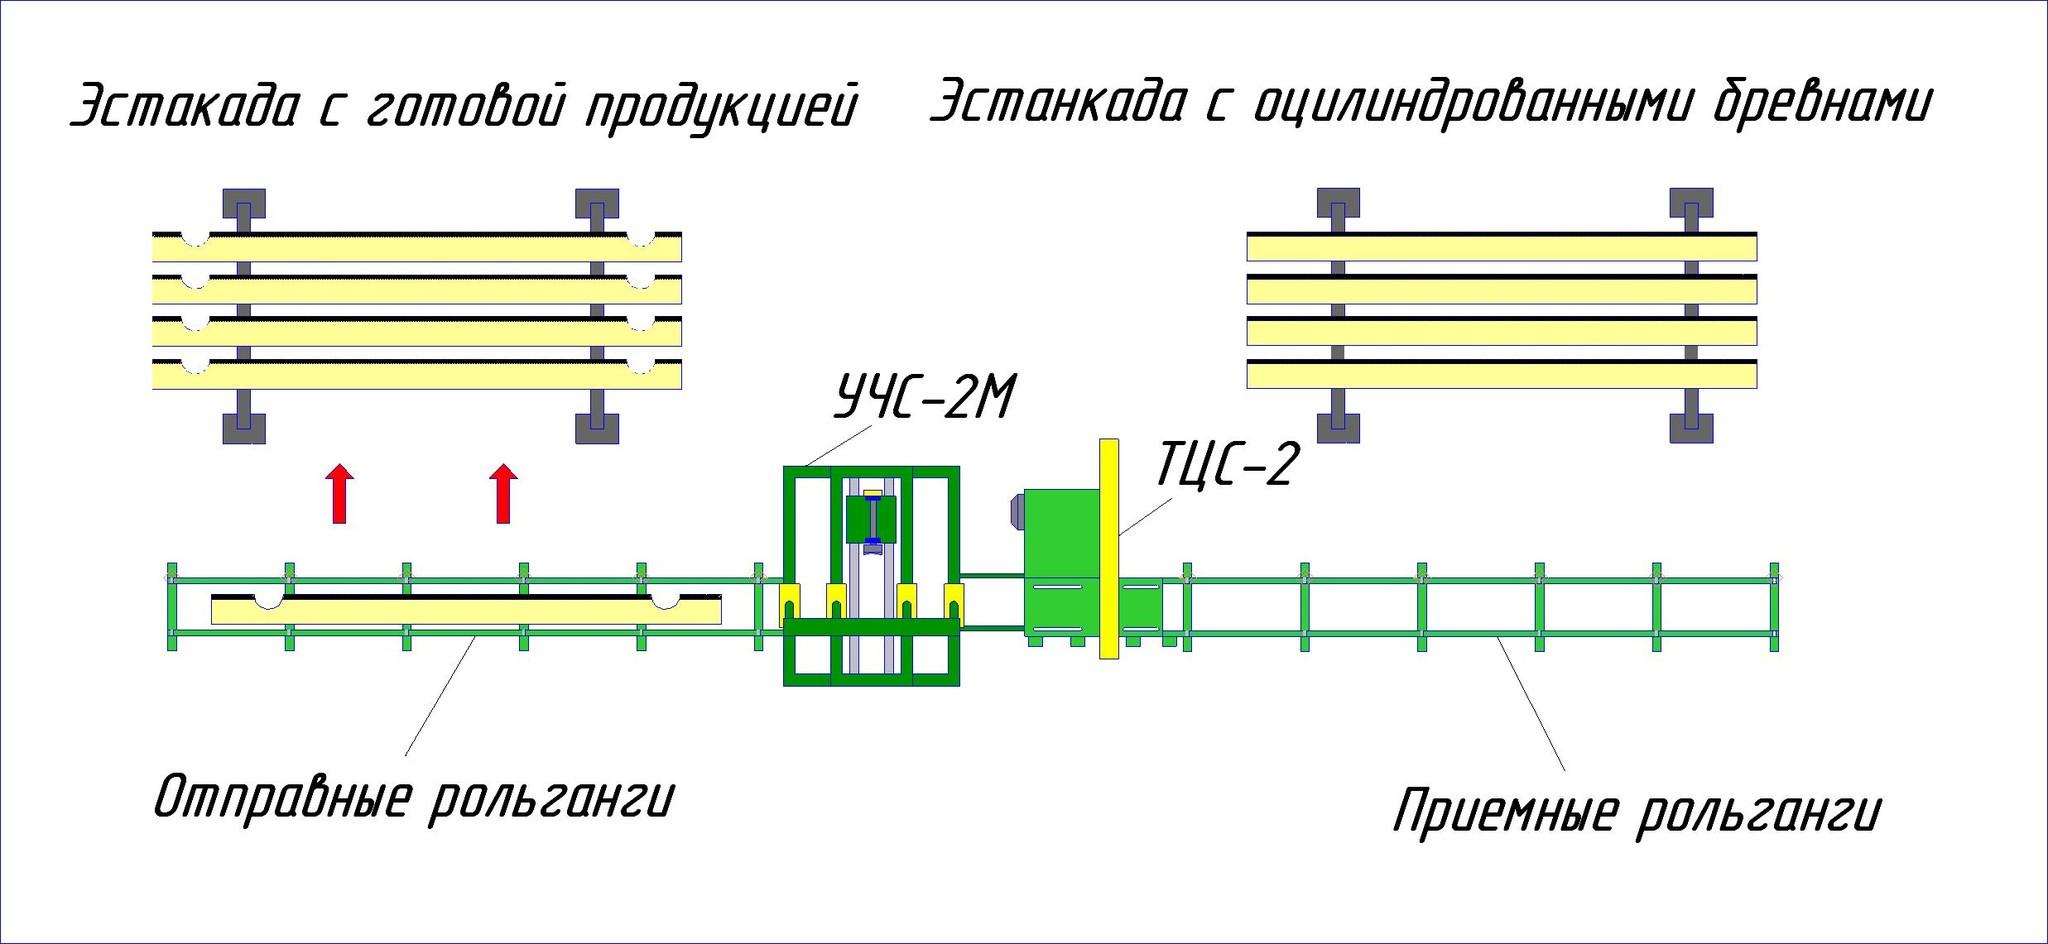 Line optimization (log notcher + trimming)